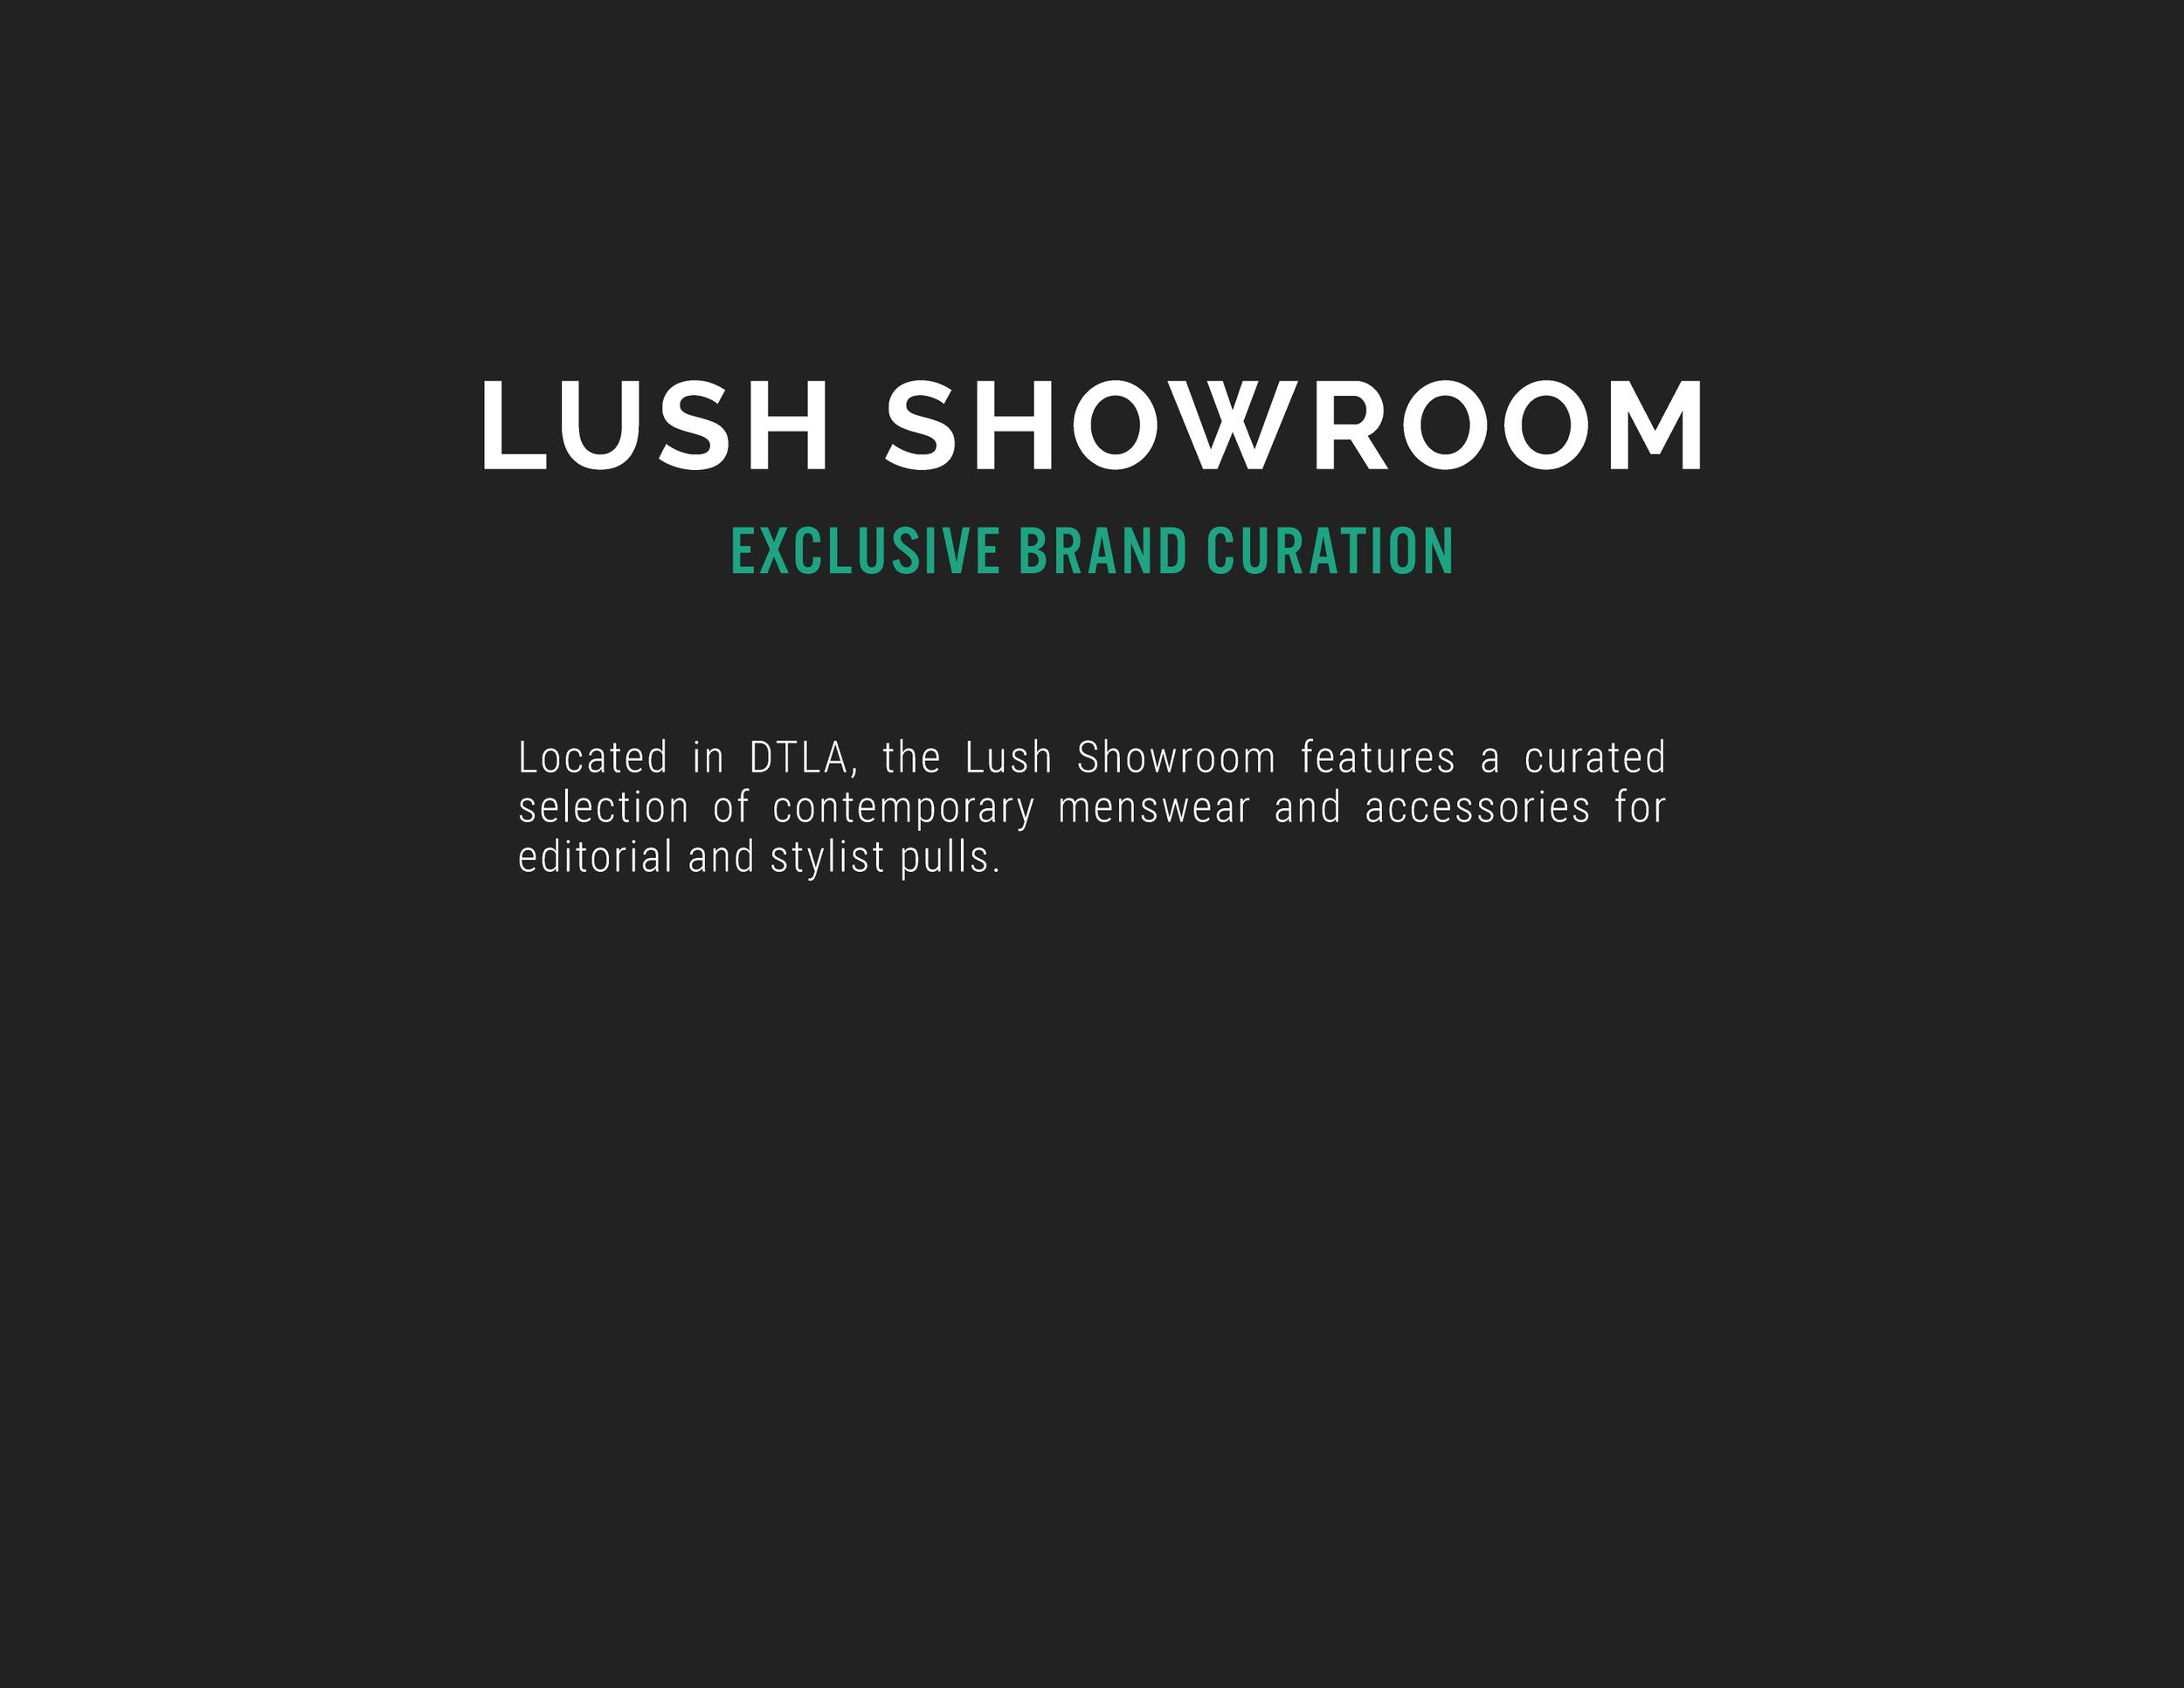 LUSH_17-SHOWROOM.png